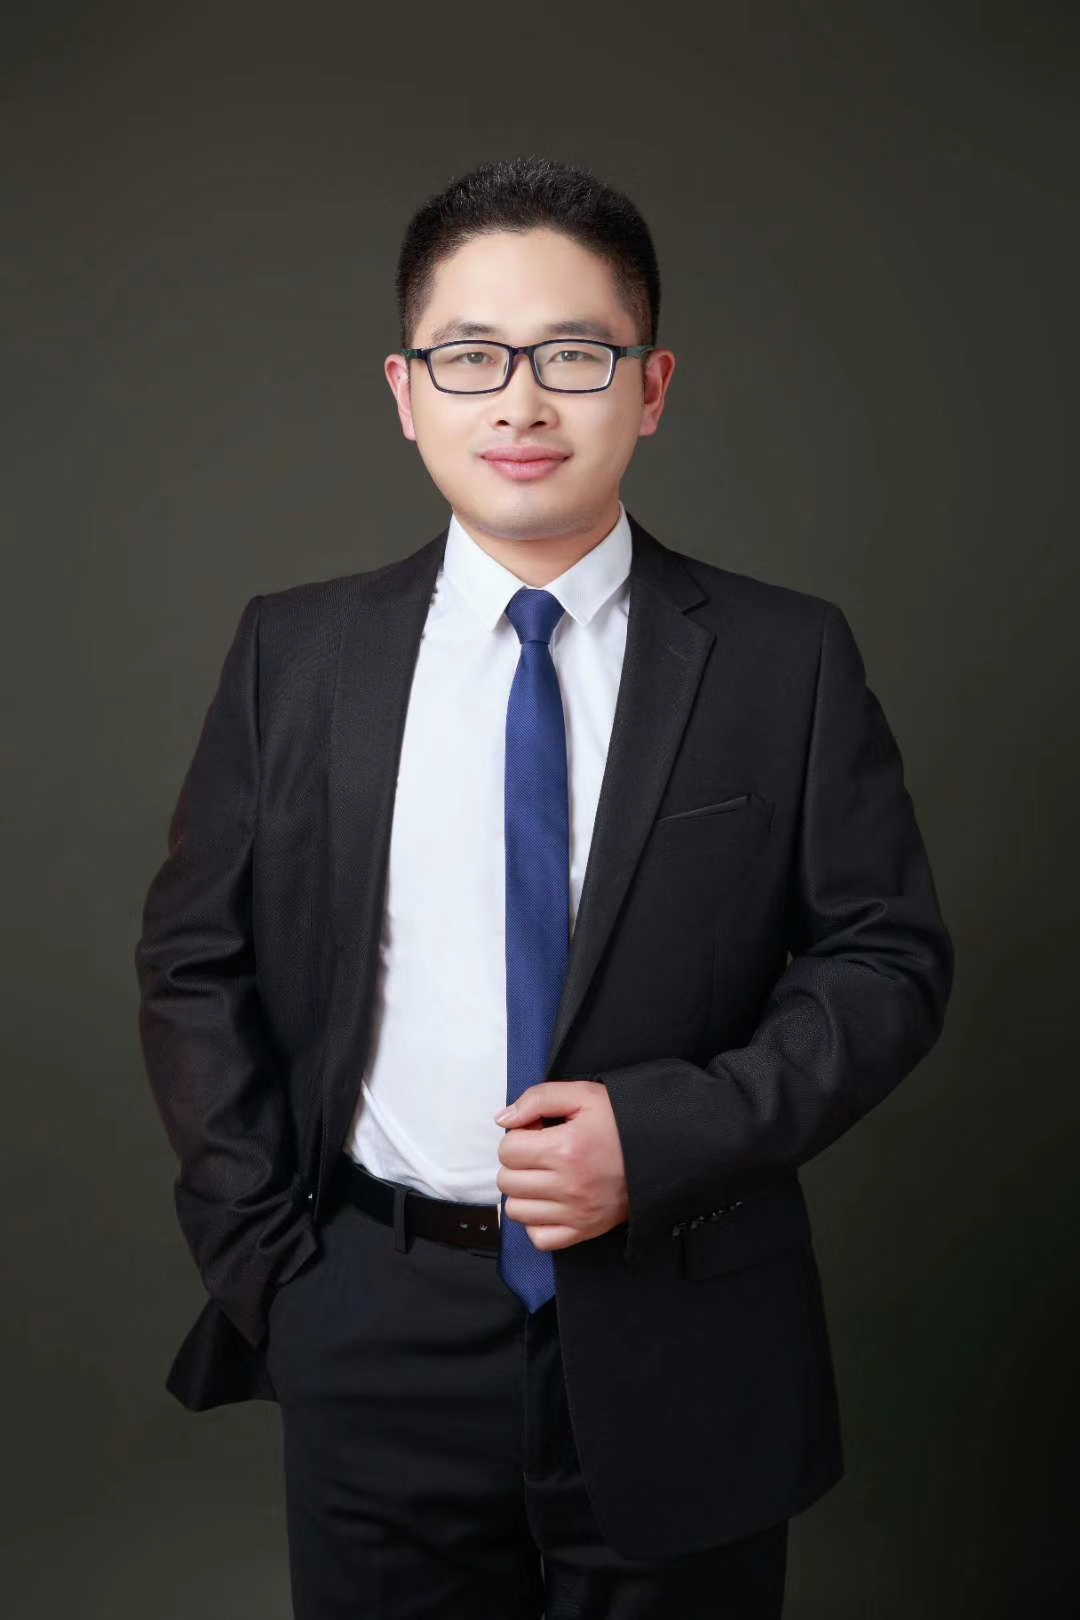 title='李冬雪律师'